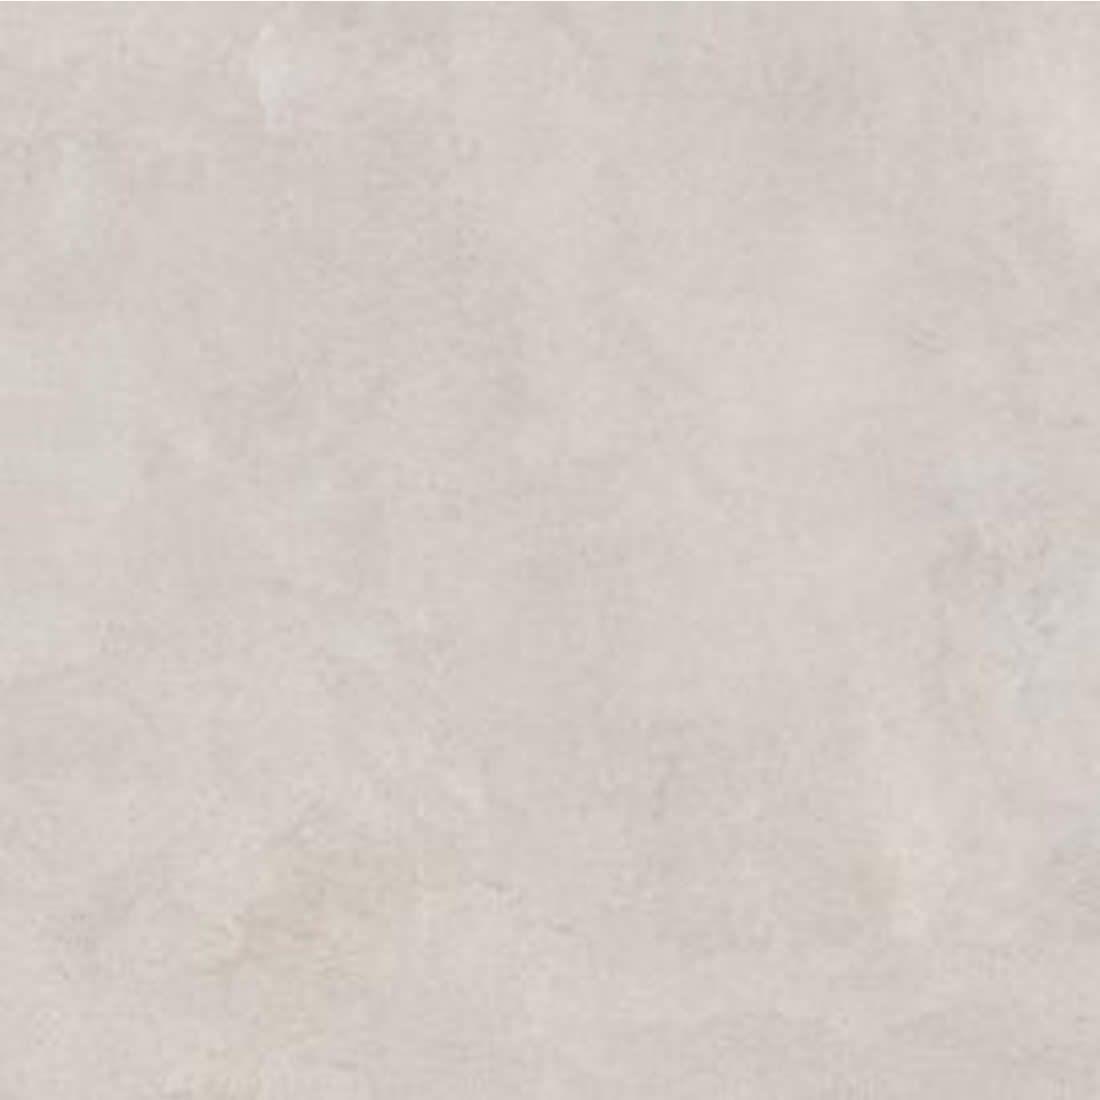 Porcelanato Embramaco 62 x 62 Majestic Gray Acetinado Ref: 62101